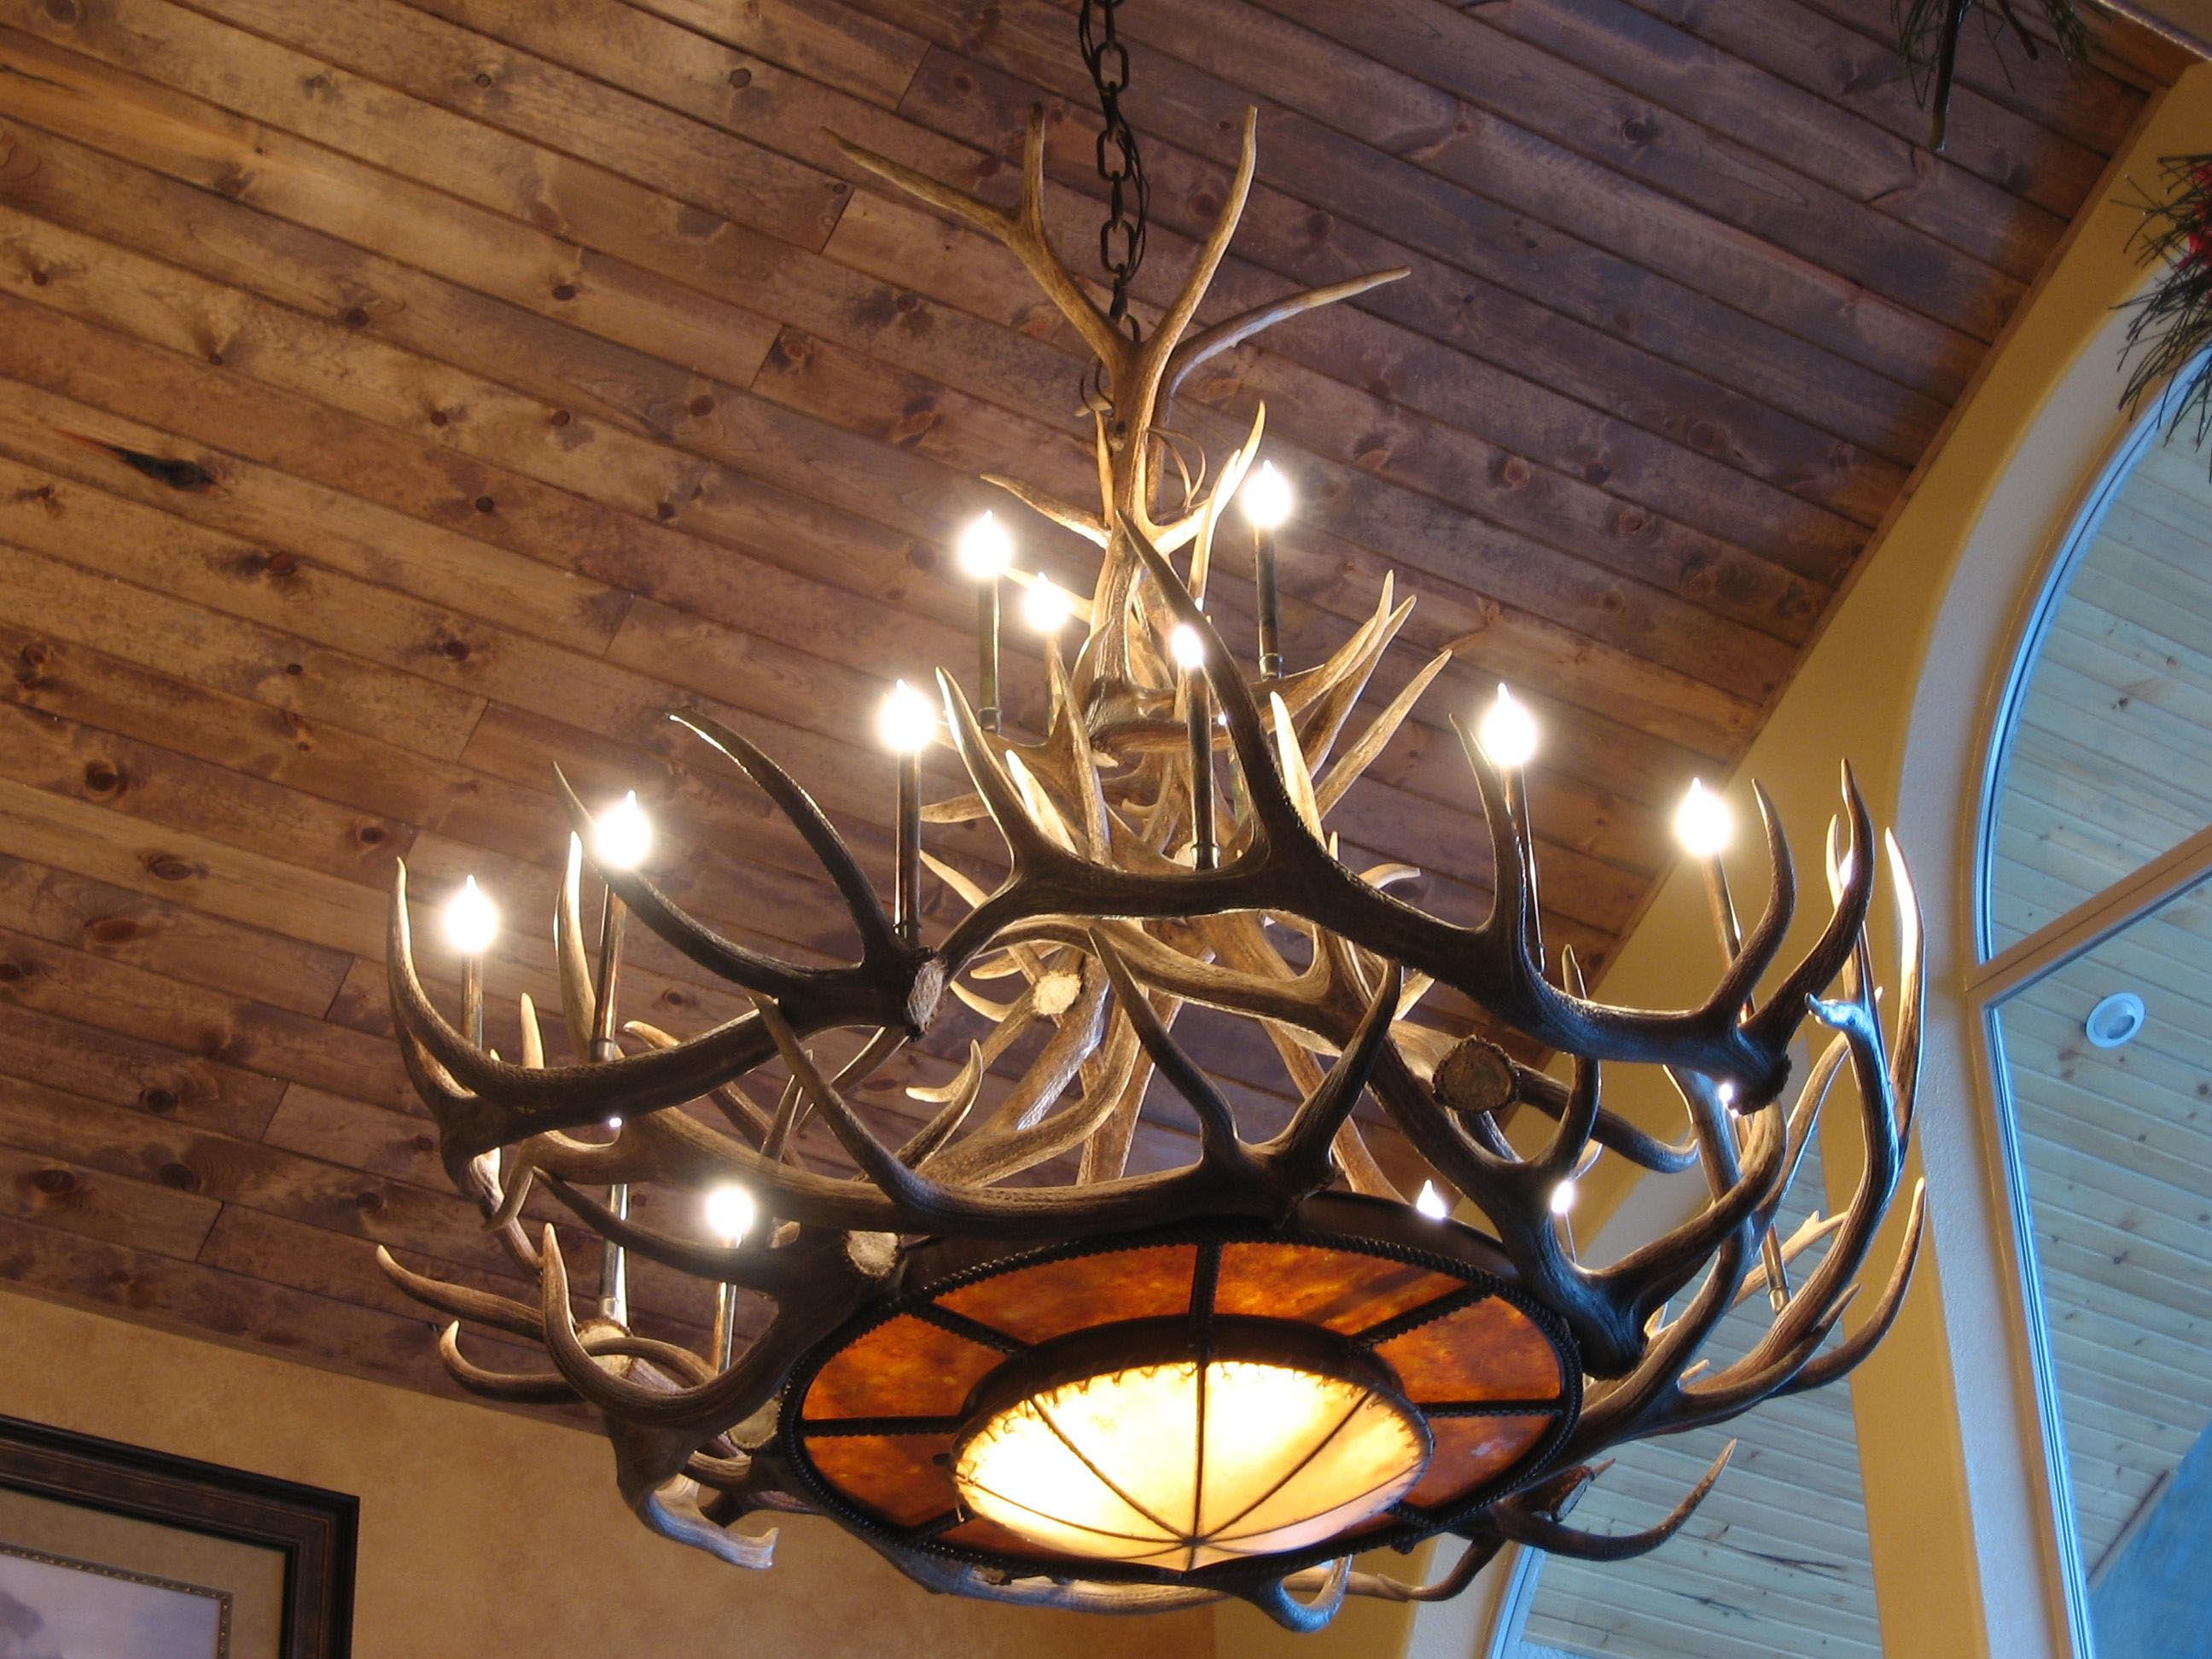 Deer Antler Ceiling Fans Best One For Your Home Warisan Lighting